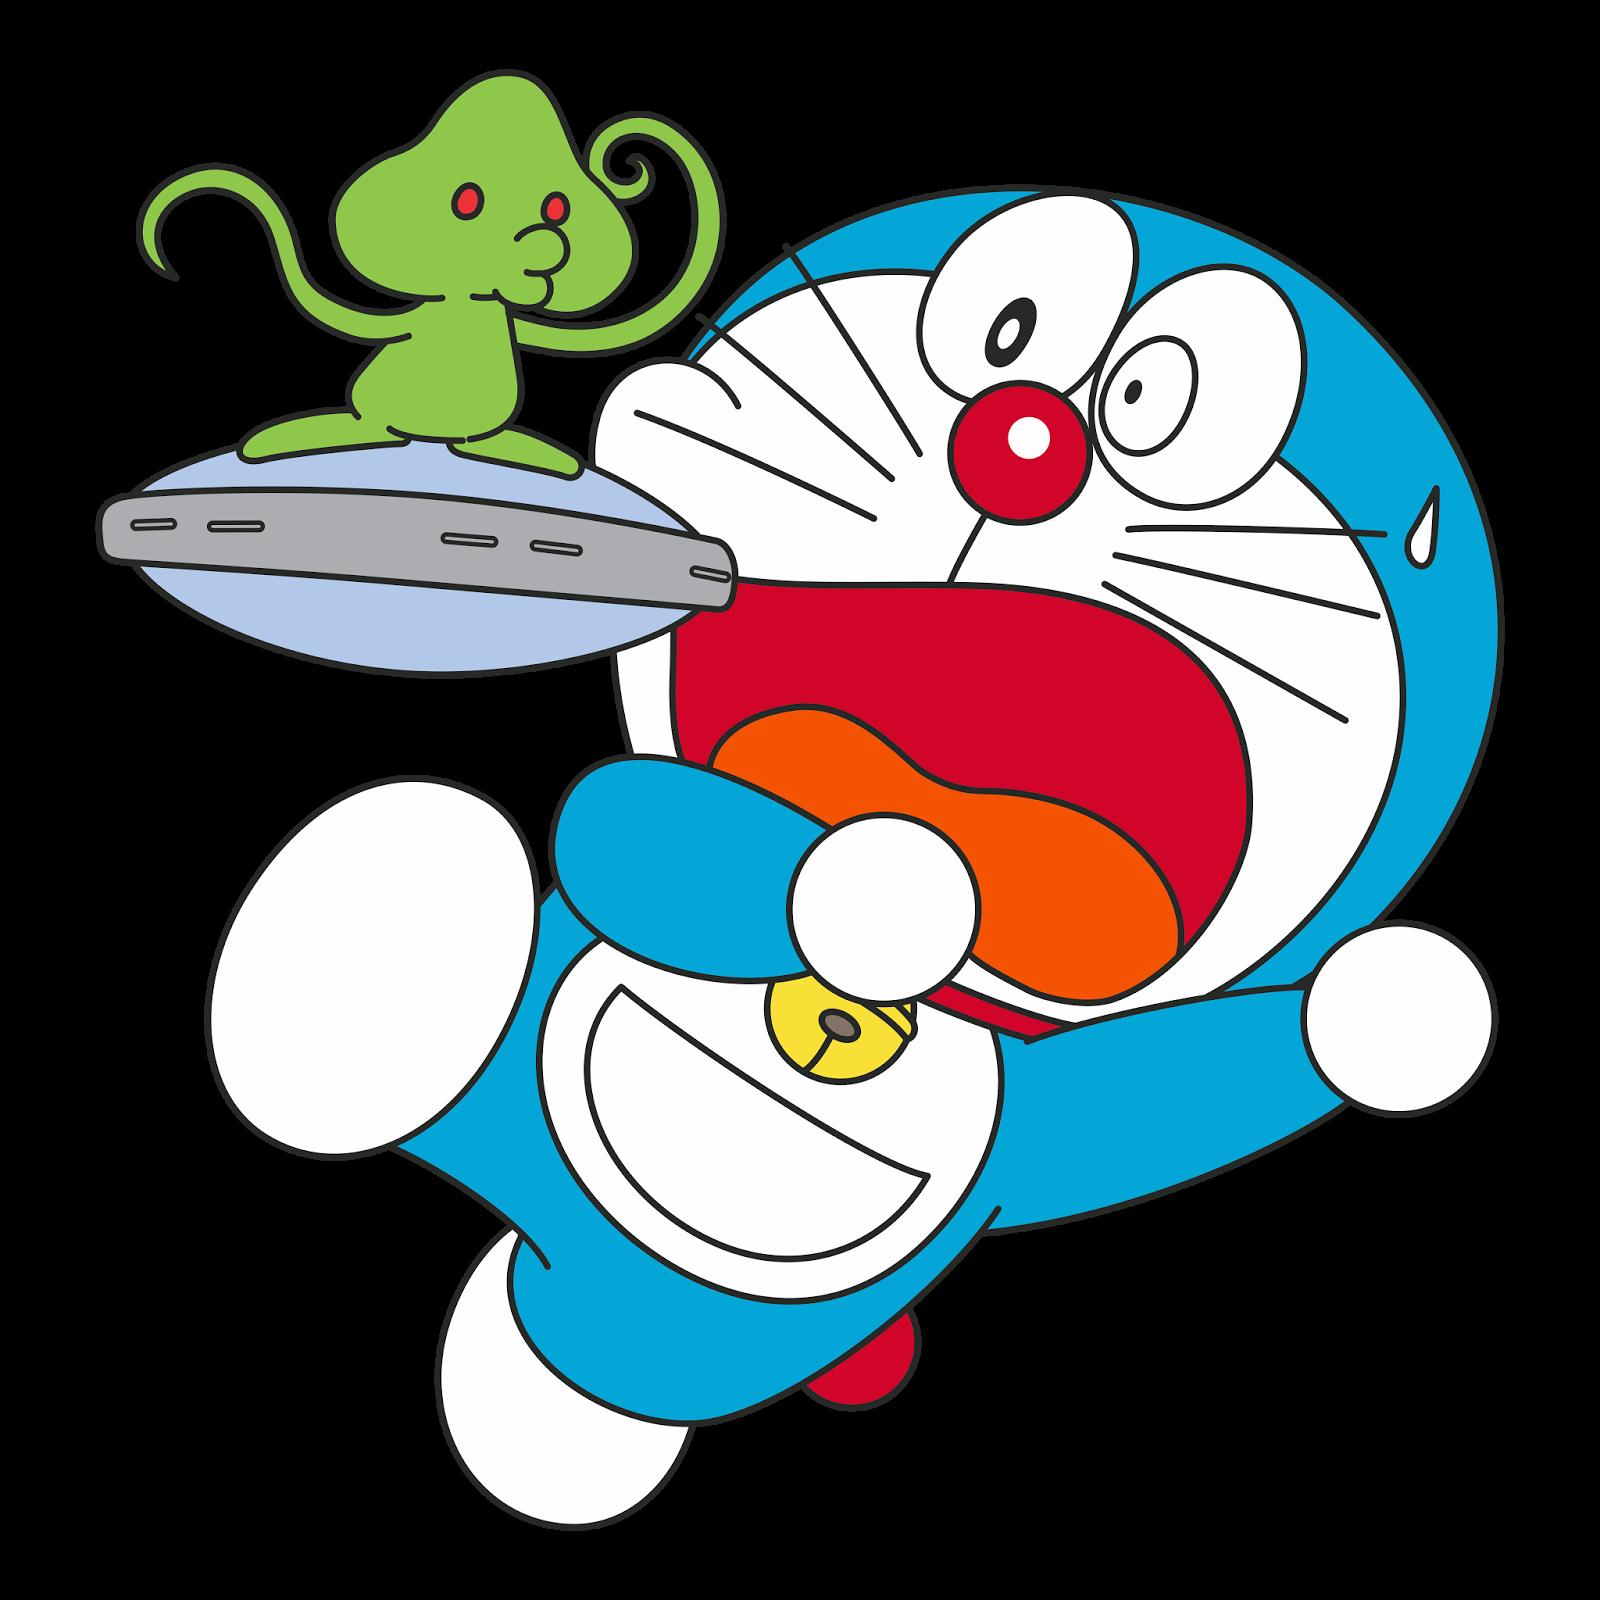 Unduh 9800 Gambar Kartun Doraemon Vector Paling Keren